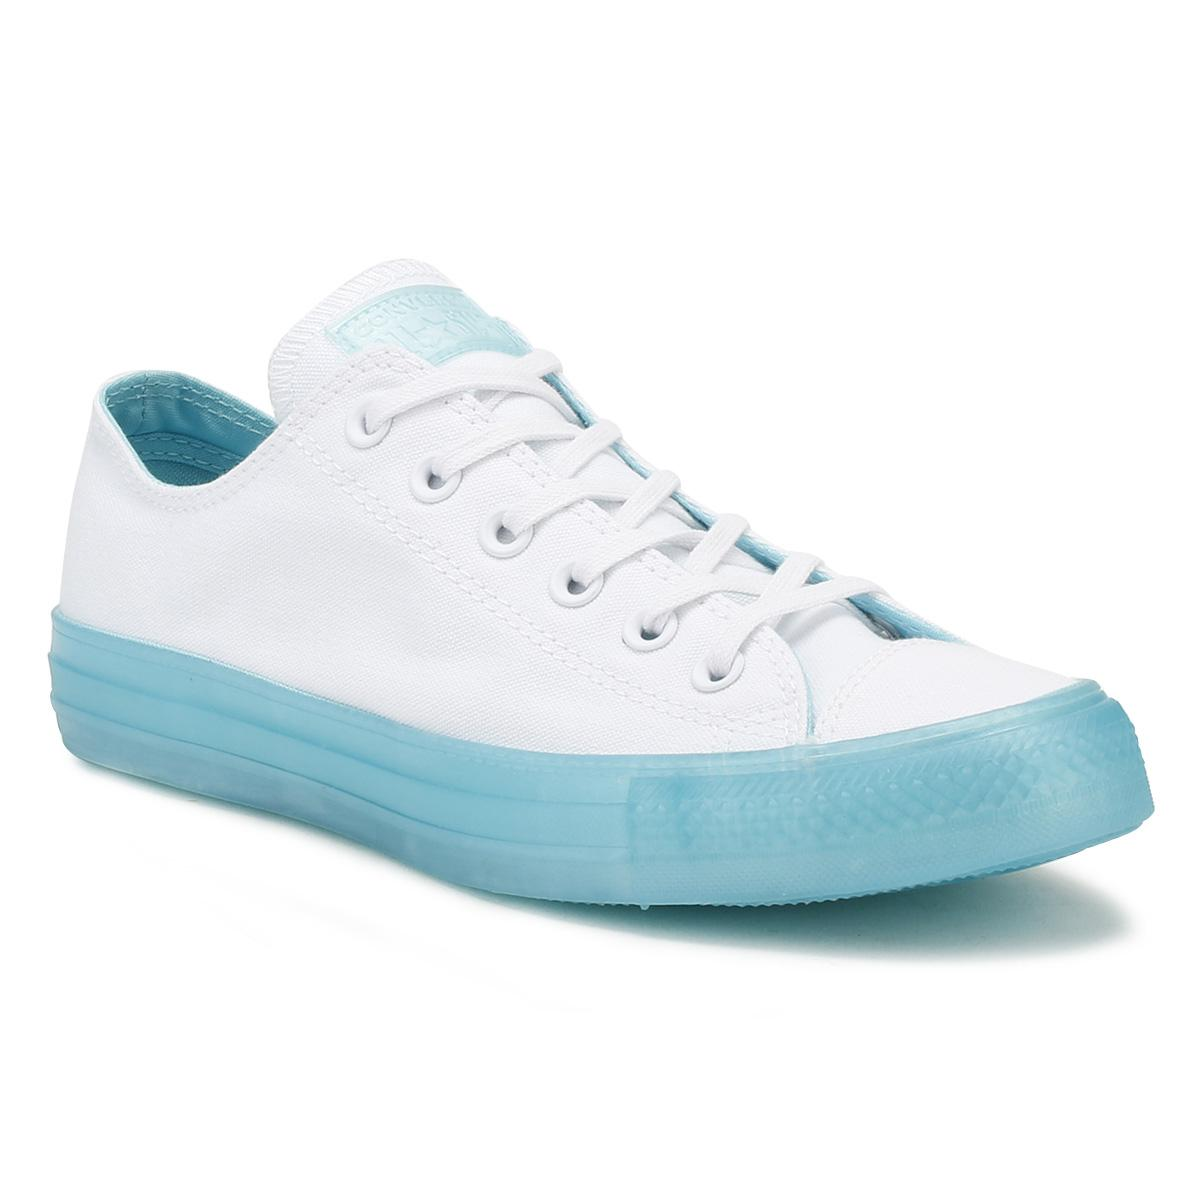 bb0d7d929e85 Lyst - Converse All Star Womens White   Aqua Ox Trainers in Blue